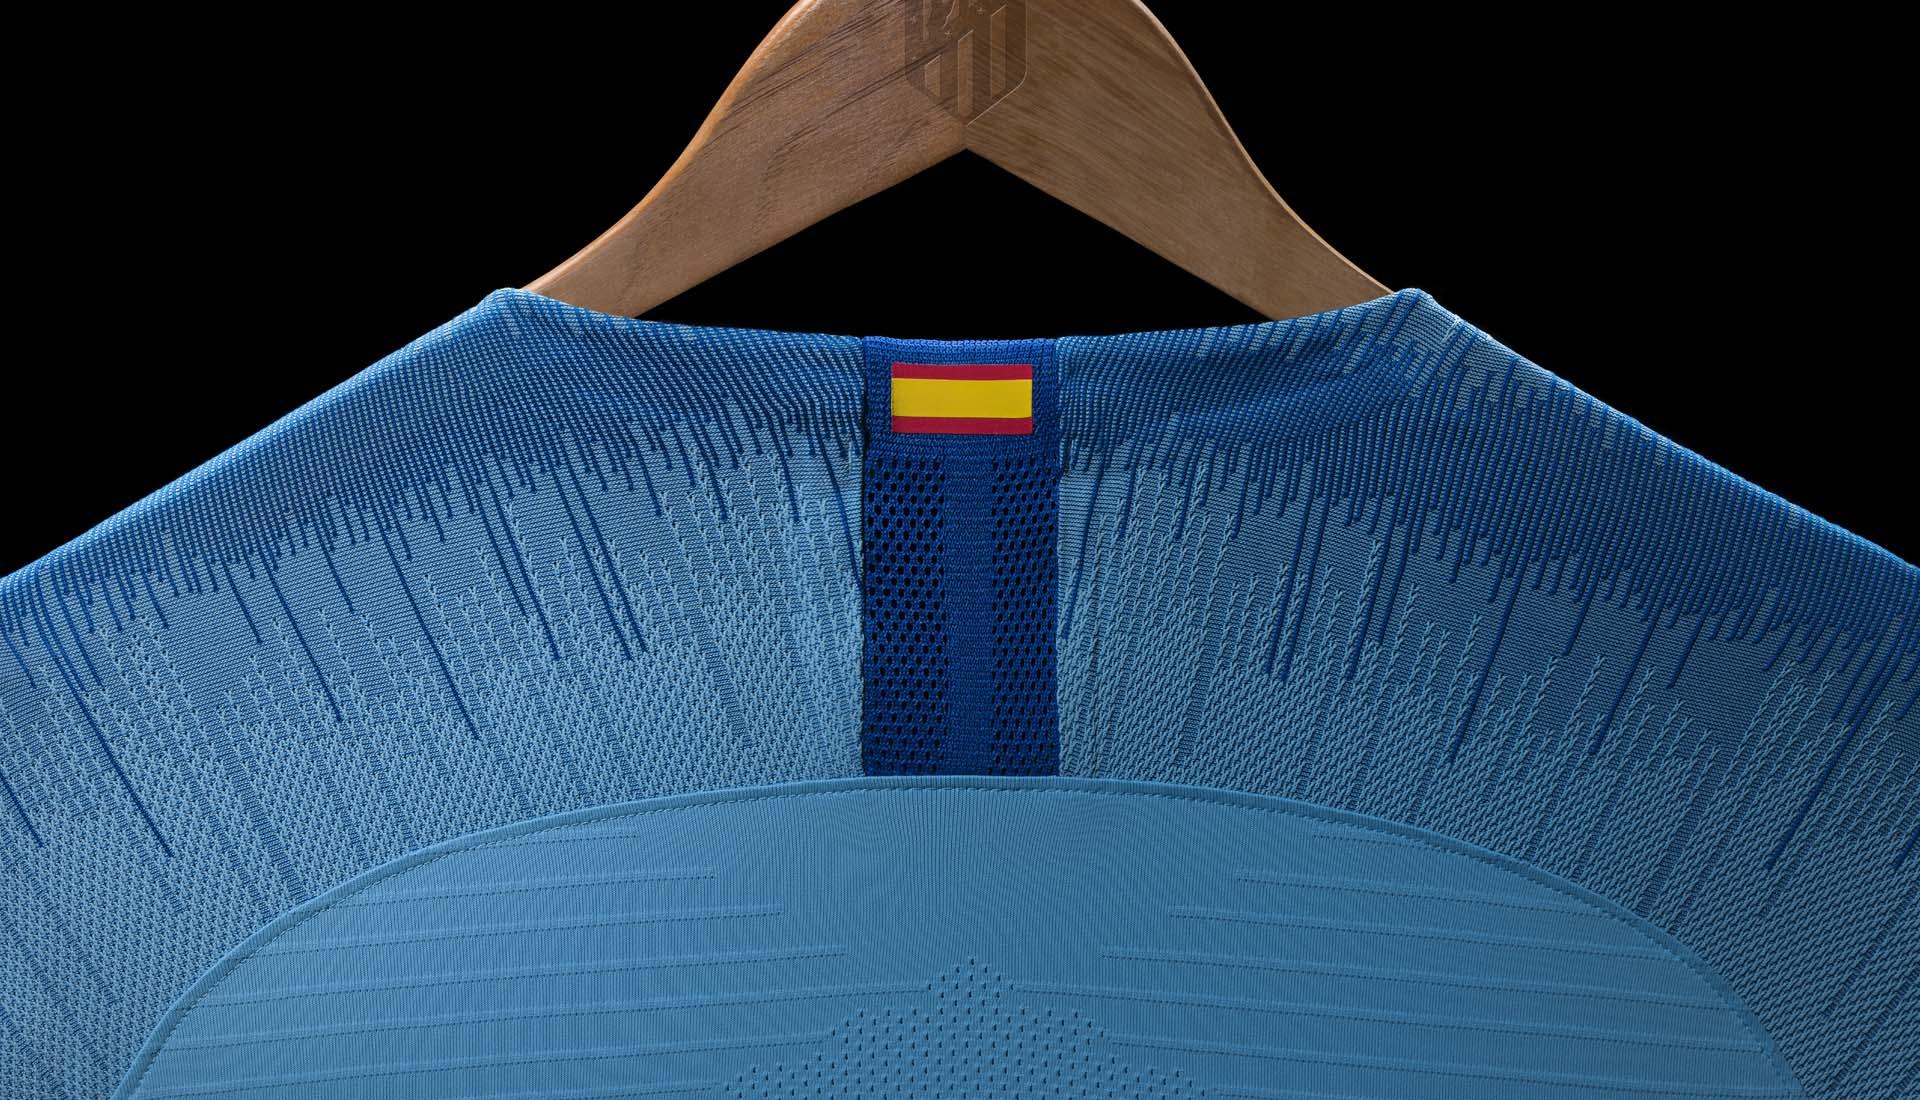 2522c6f6c ... atletcio-away-18-19-shirt.jpg. Pick up the Atletico Madrid ...